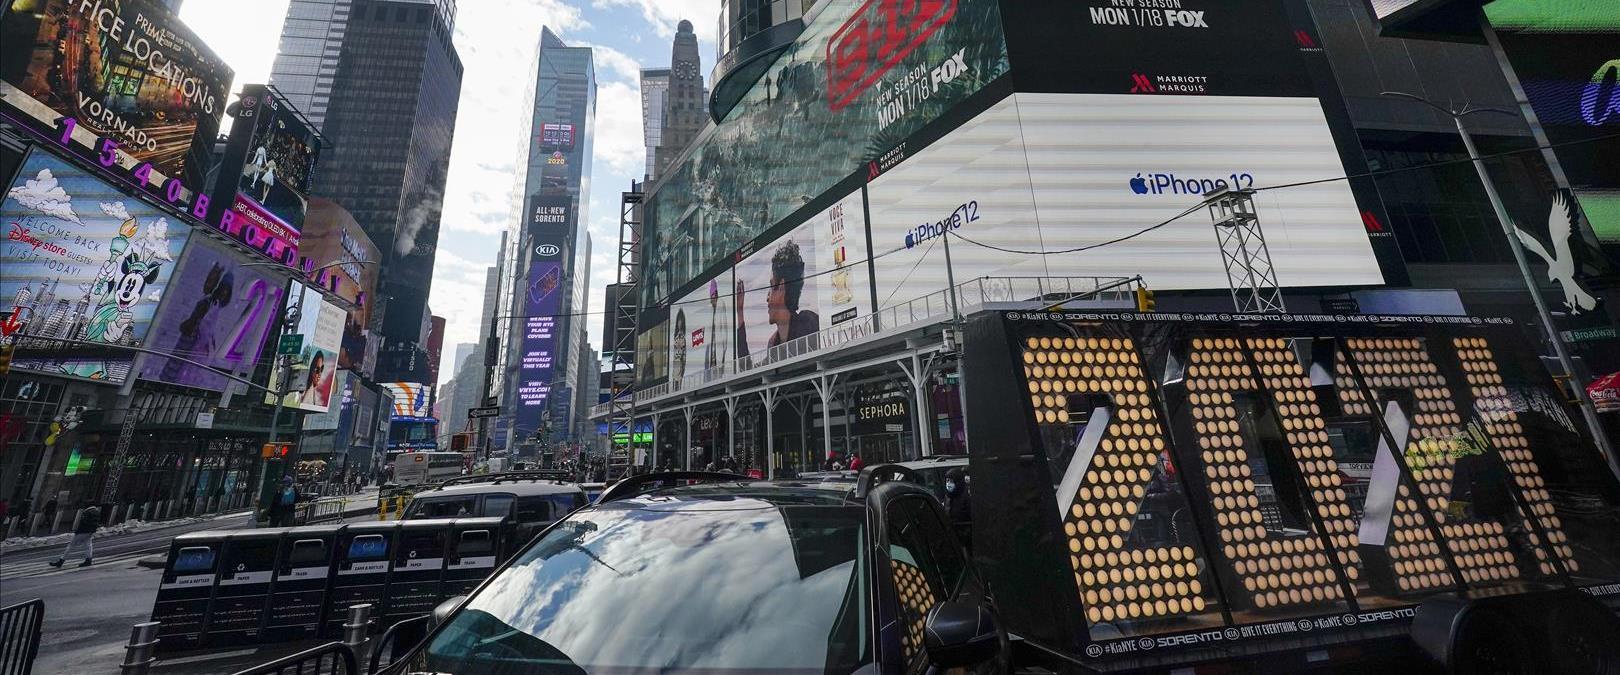 כיכר טיימס בניו יורק, השבוע